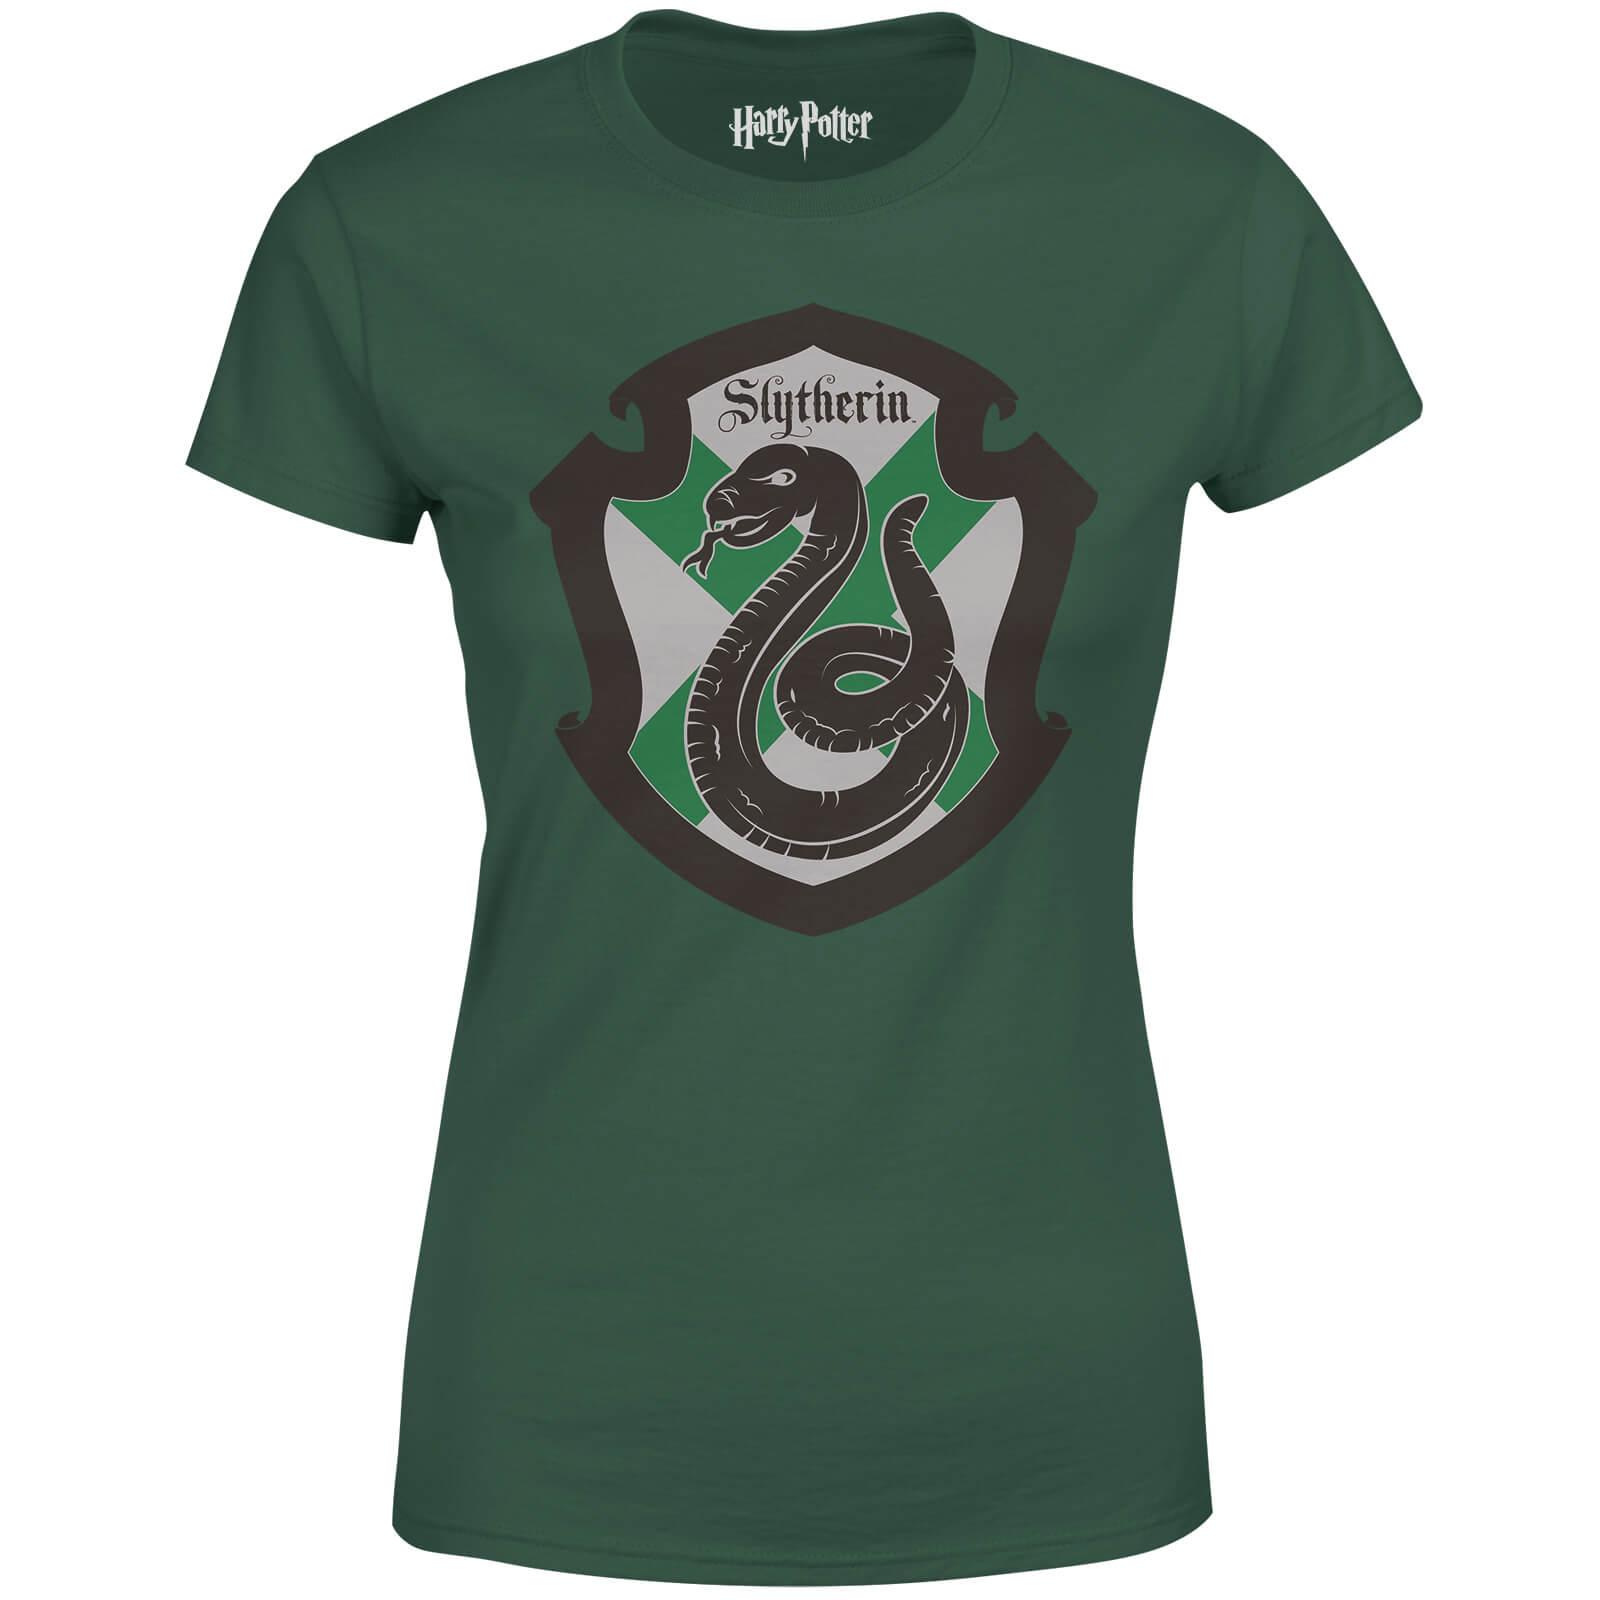 Harry Potter Slytherin House Green Women's T-Shirt - L - Green